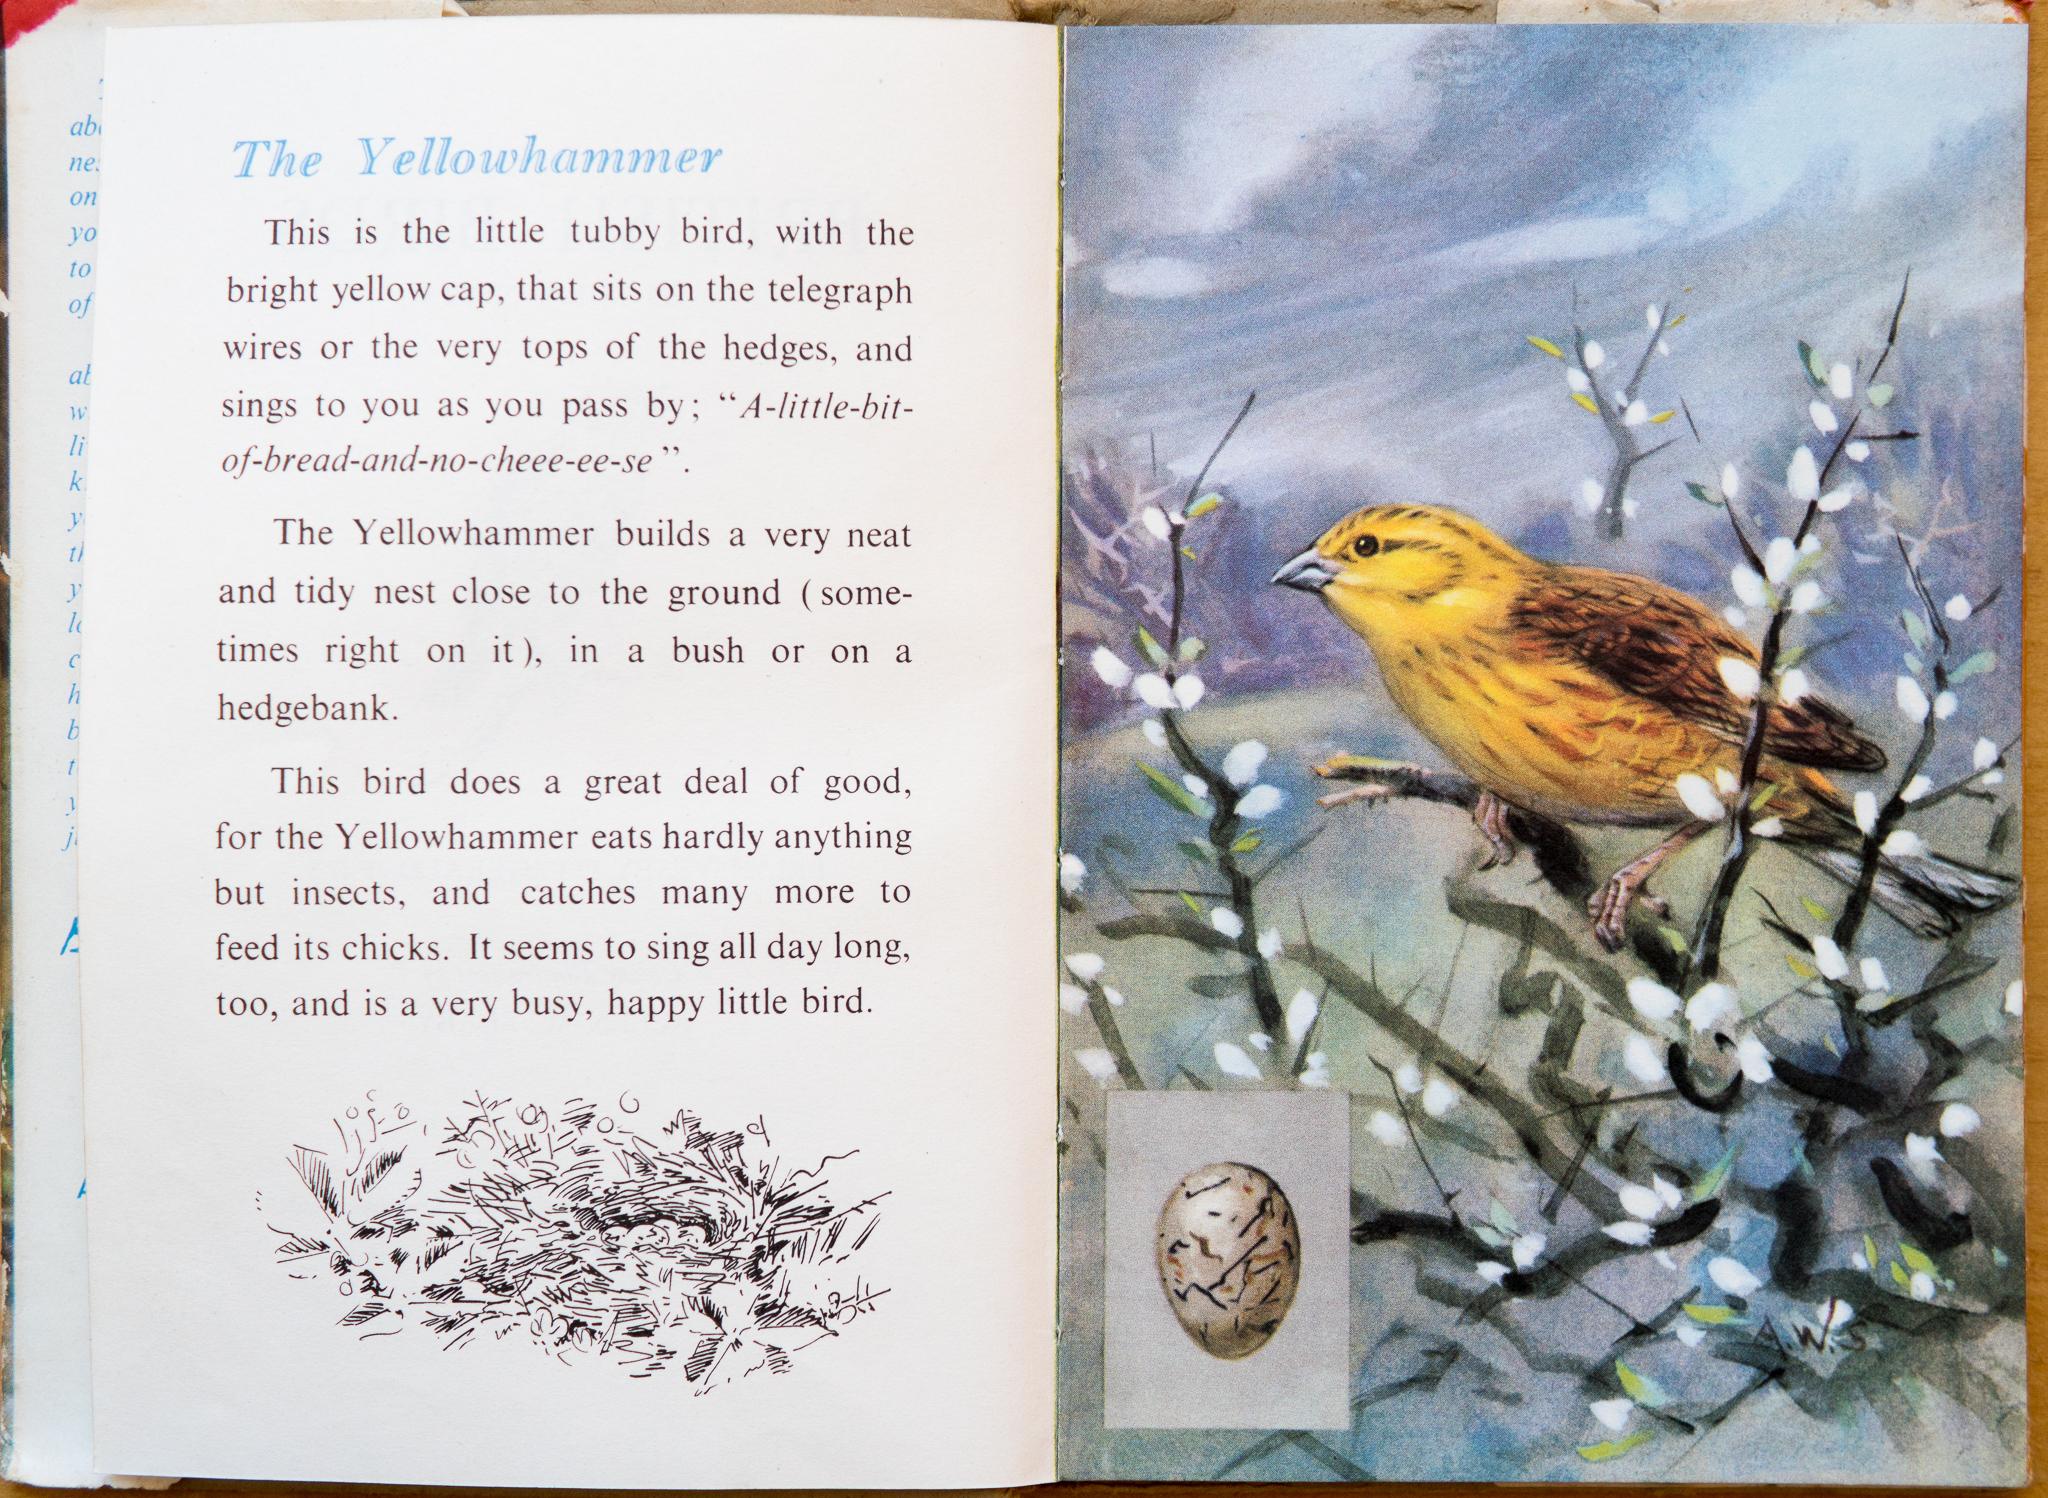 Ladybird Book of British Birds - Yellowhammer - The Hall of Einar